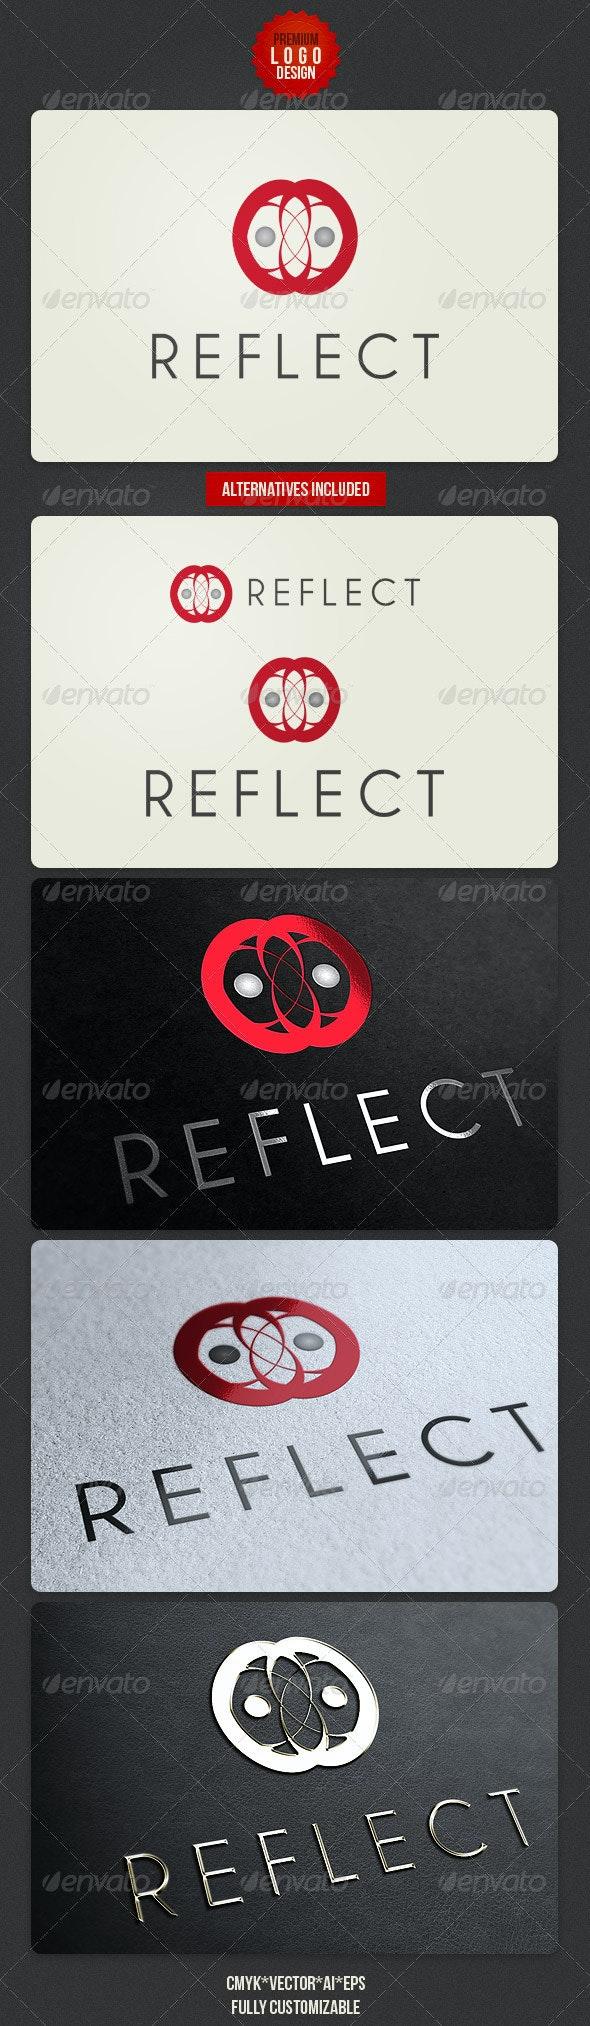 Reflect Logo Design - Symbols Logo Templates